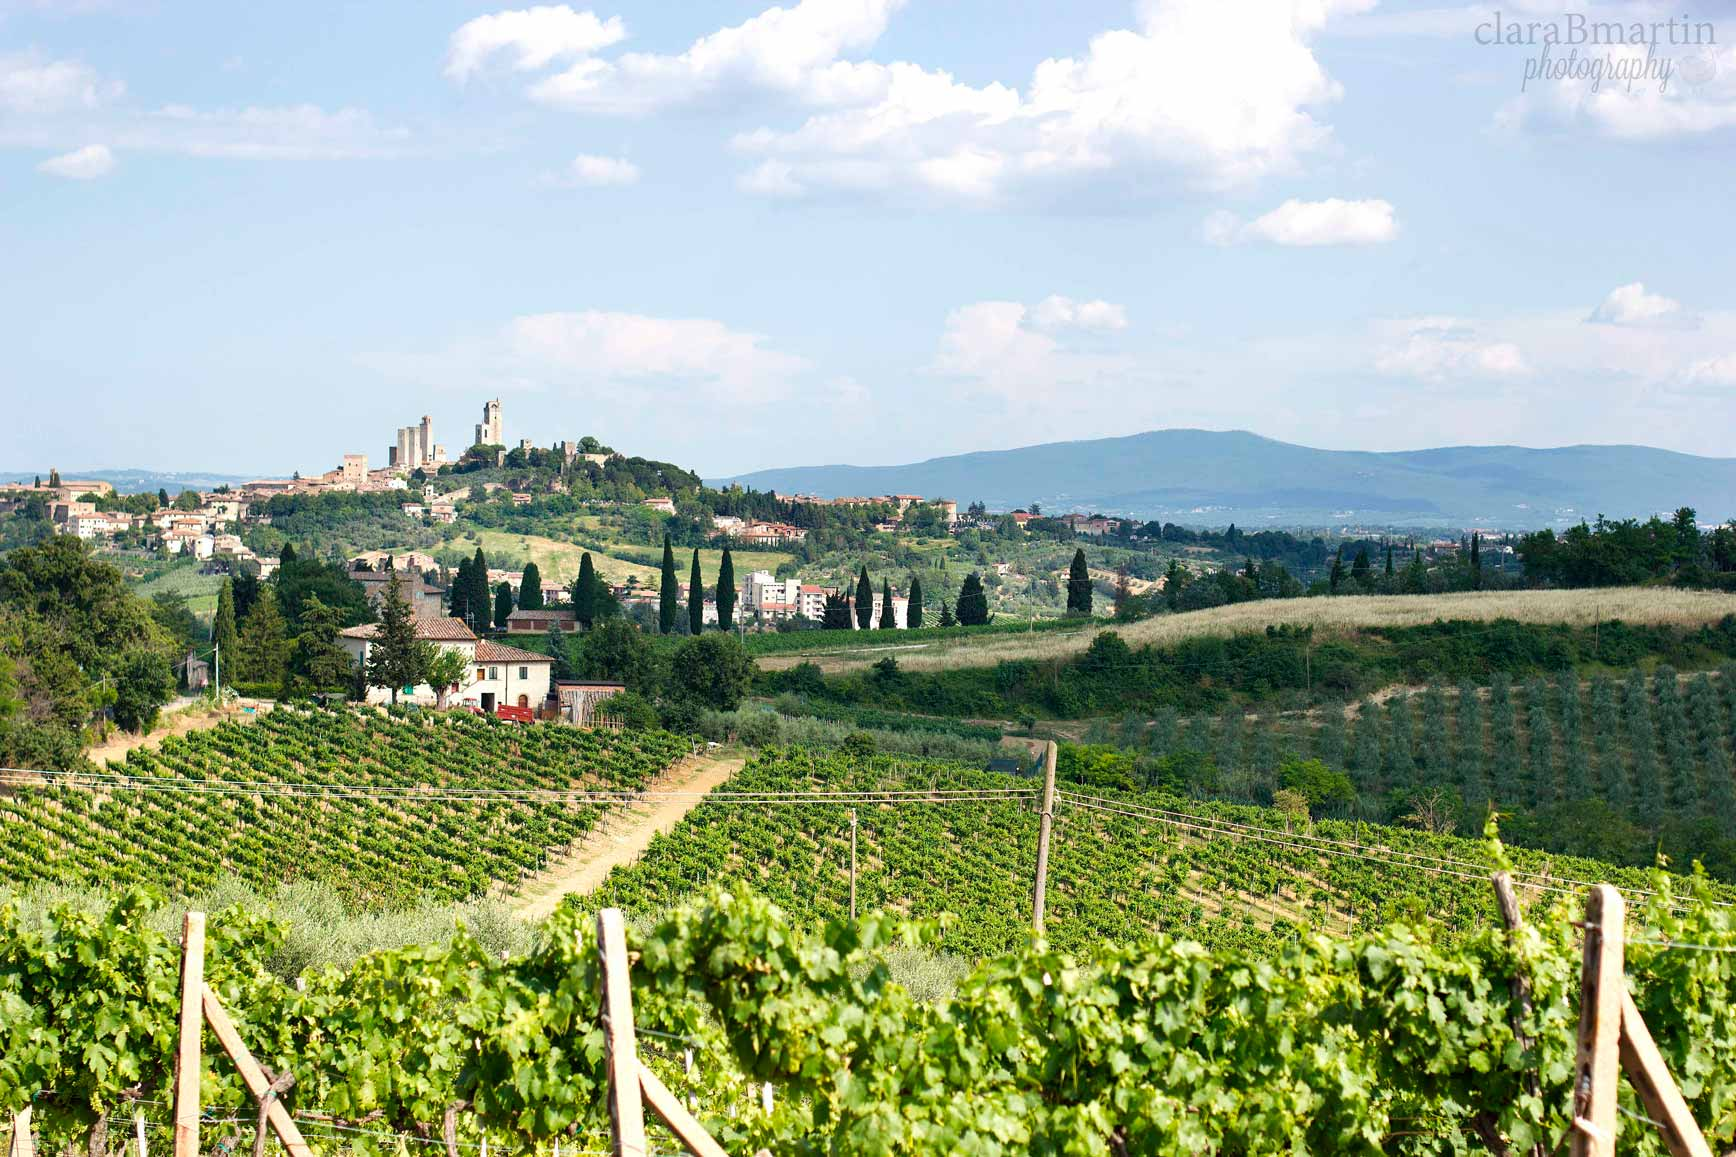 ToscanaclaraBmartin_11